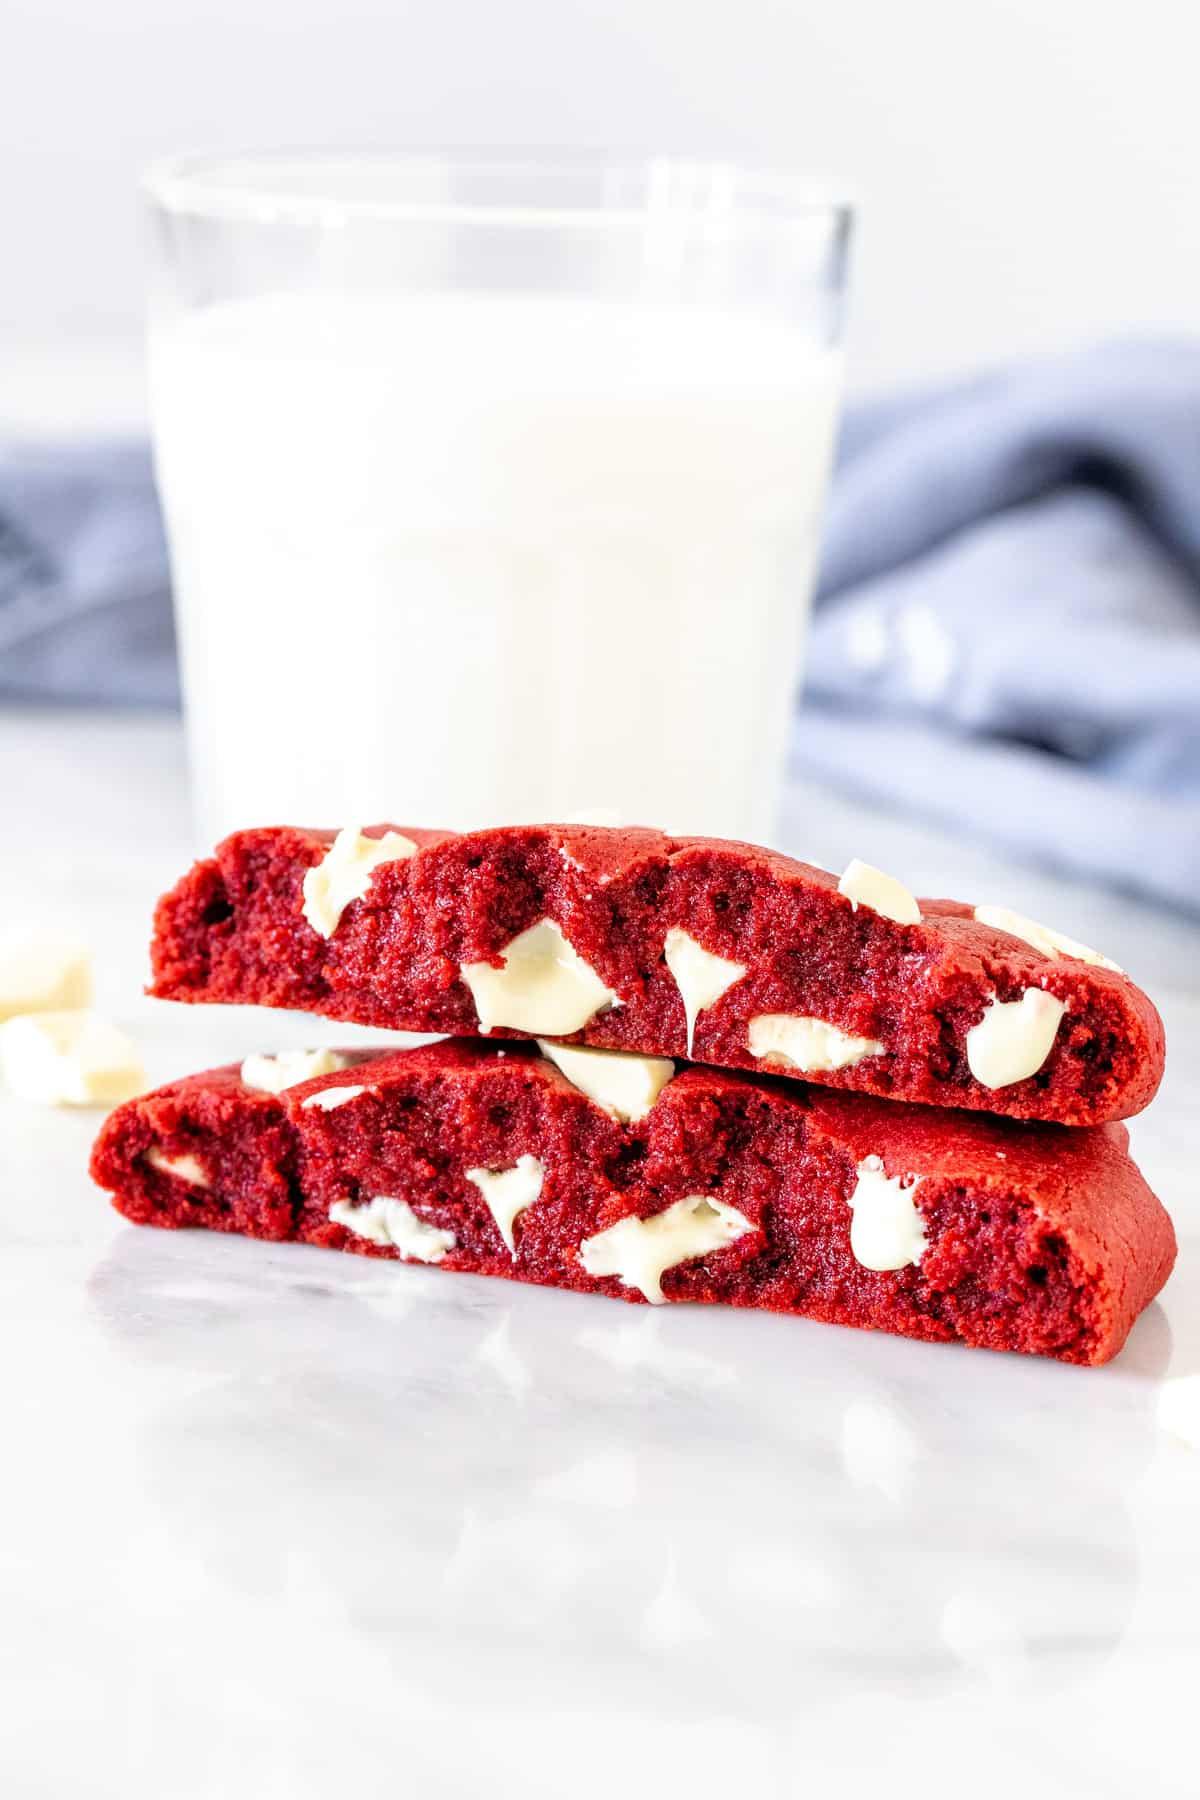 Single serving red velvet cookie, broken in half with a glass of milk